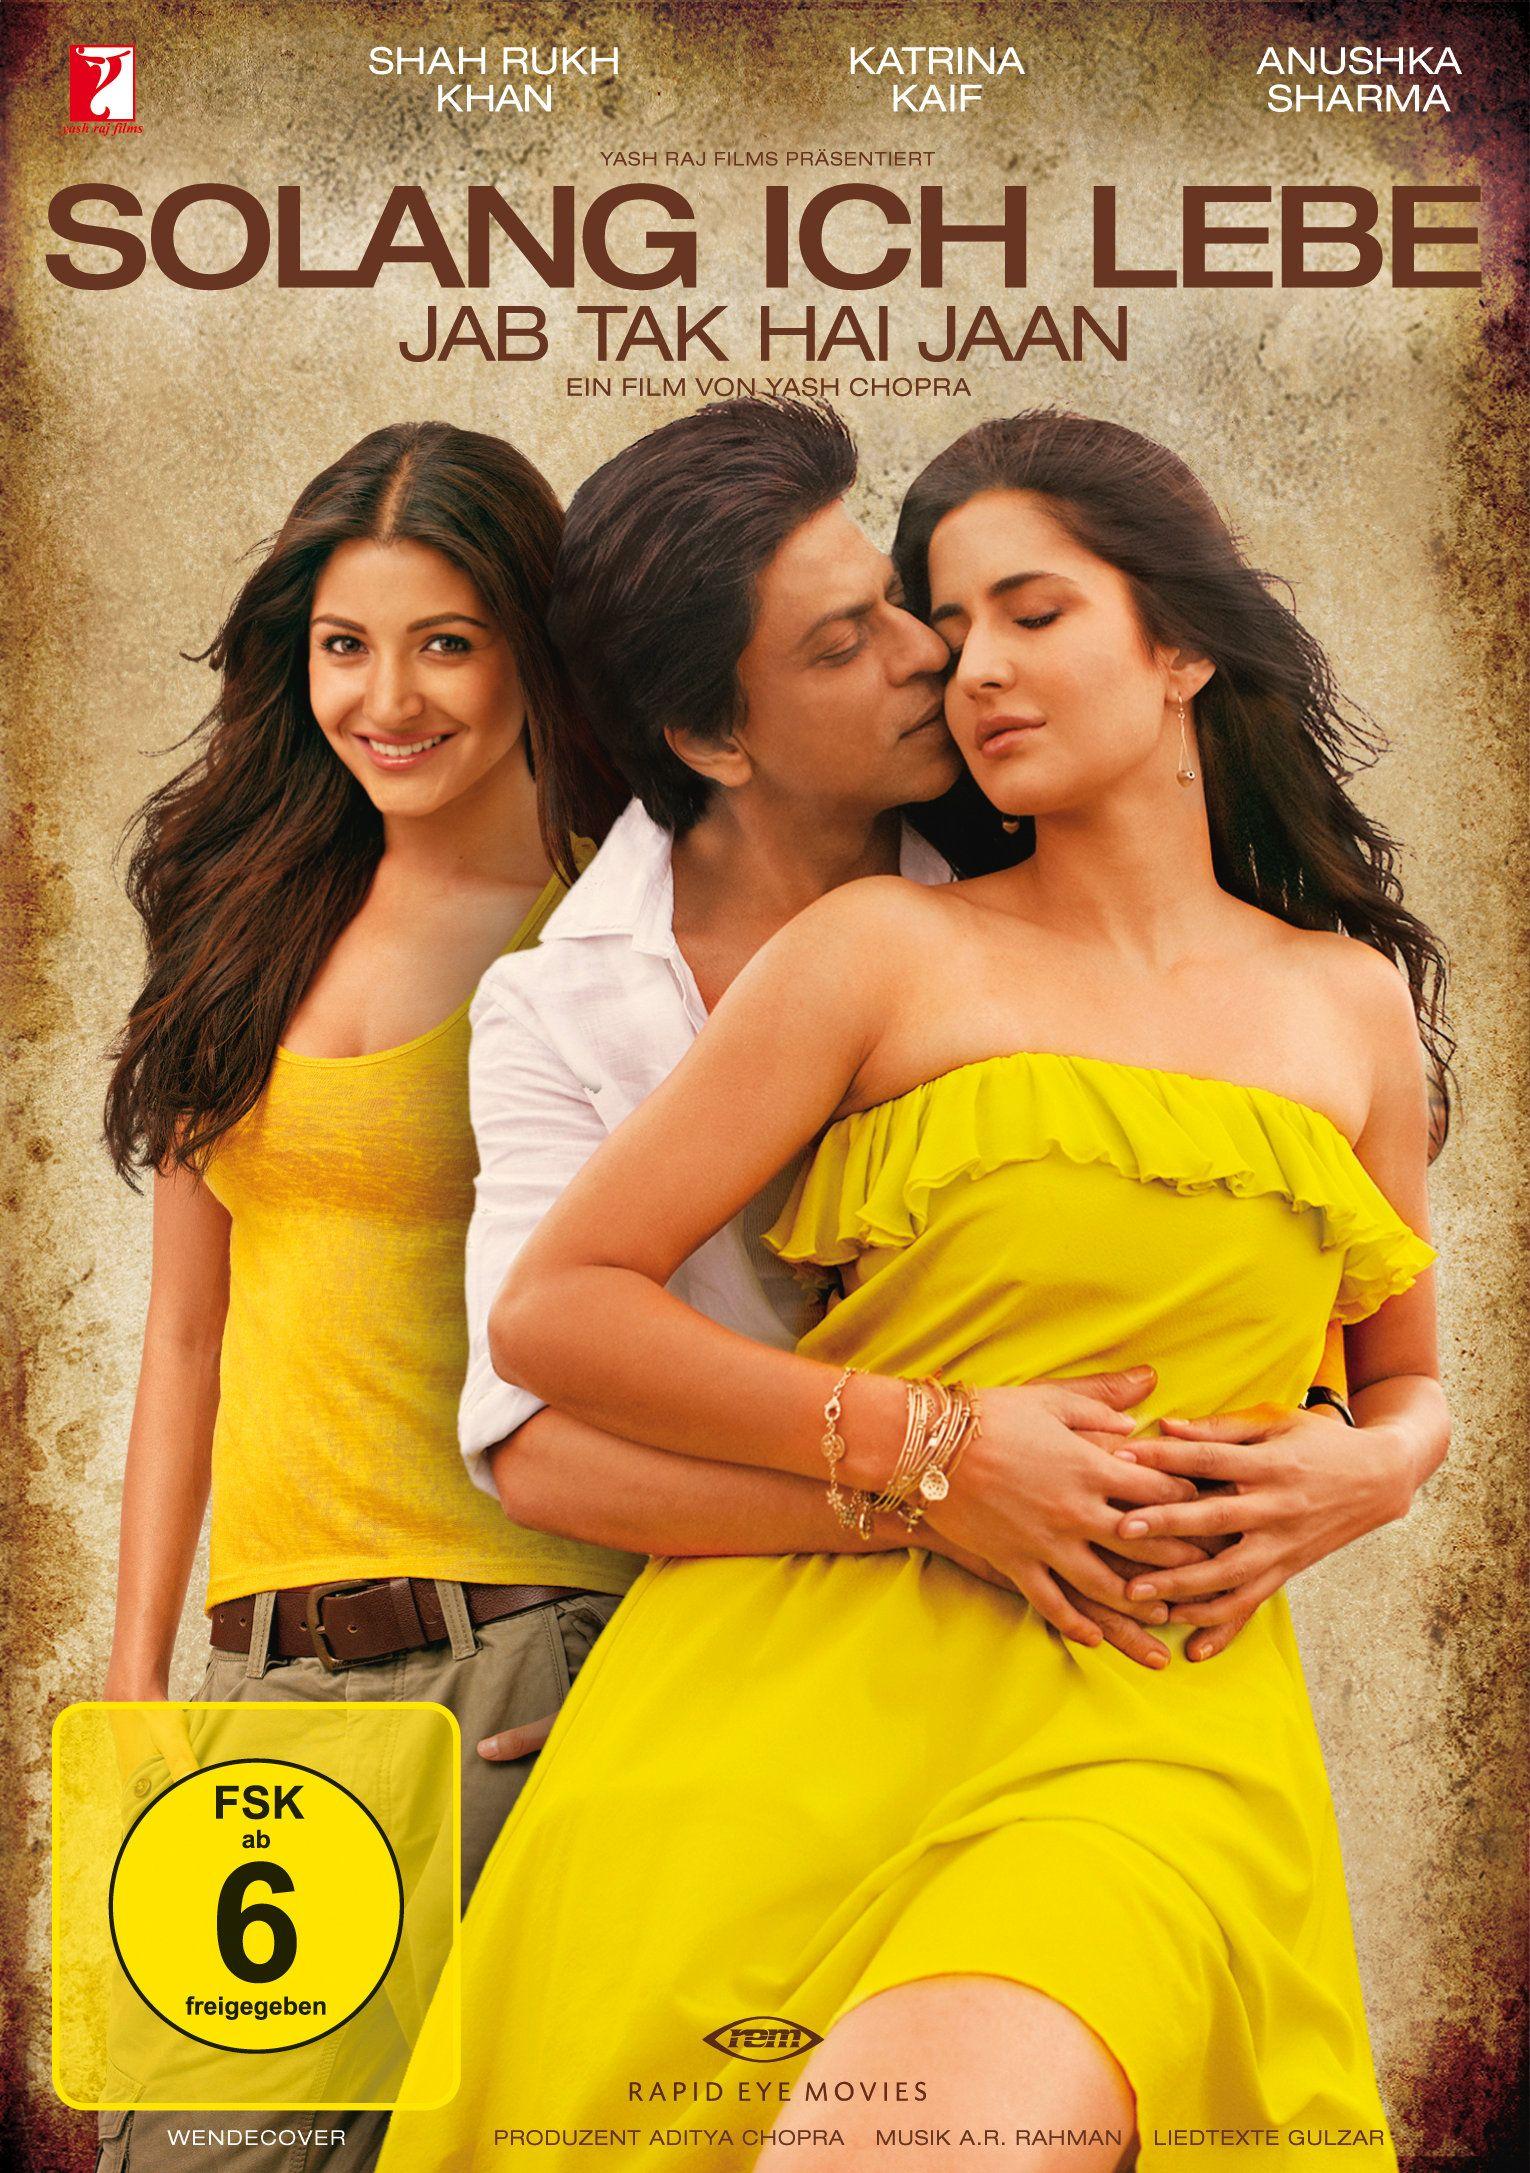 Solang Ich Lebe Jab Tak Hai Jaan Dvd Bei Weltbild De Bestellen Solang Ich Lebe Indische Filme Bollywood Stars